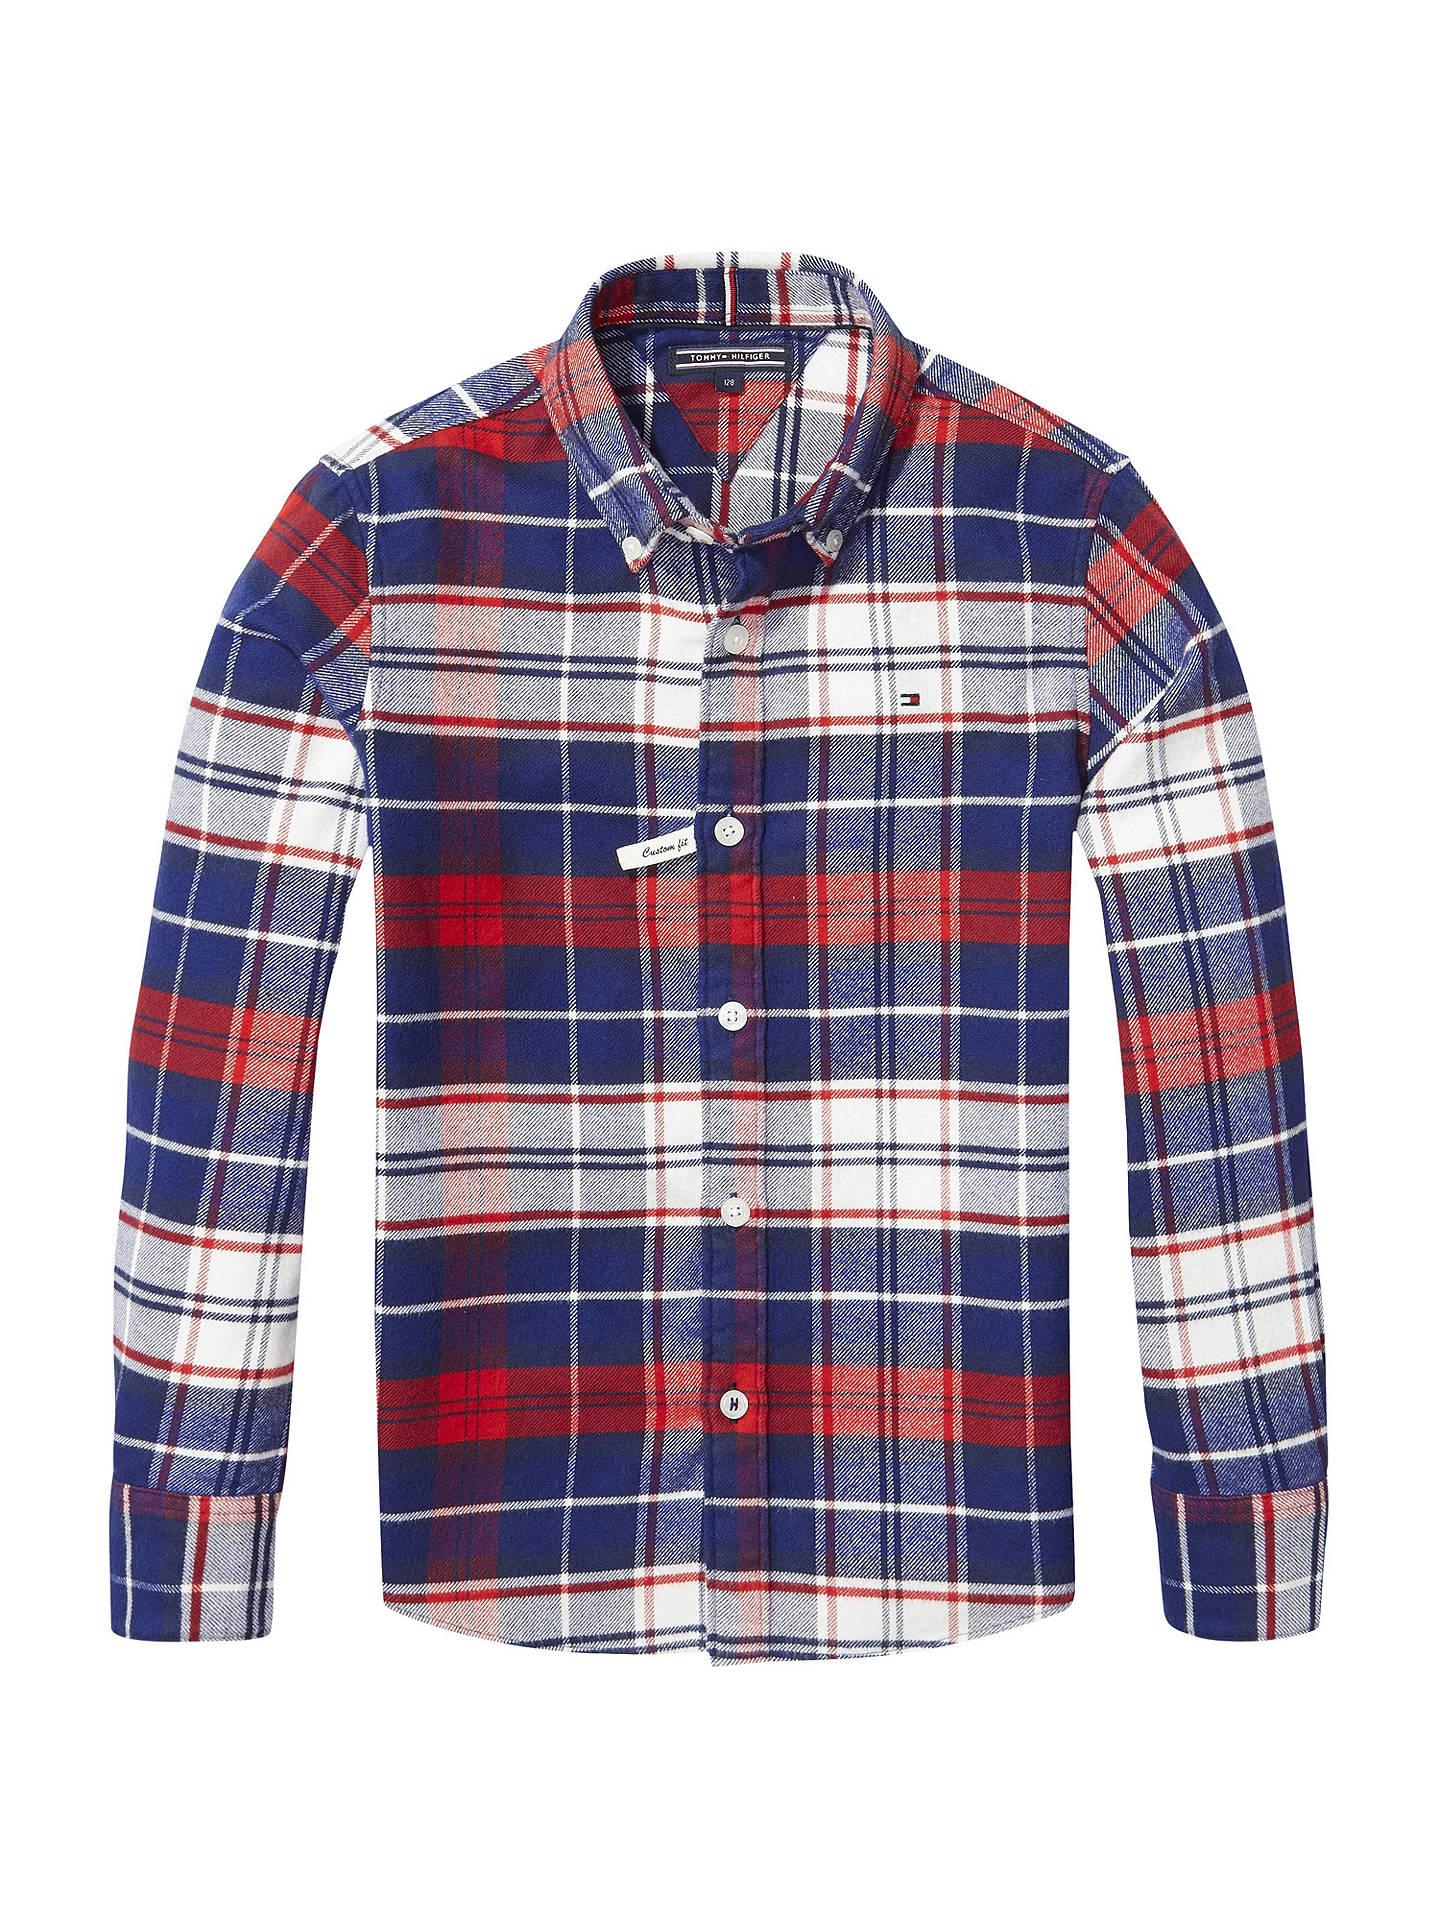 1eeae54f3d5 Tommy Hilfiger Boys  Check Long Sleeve Shirt